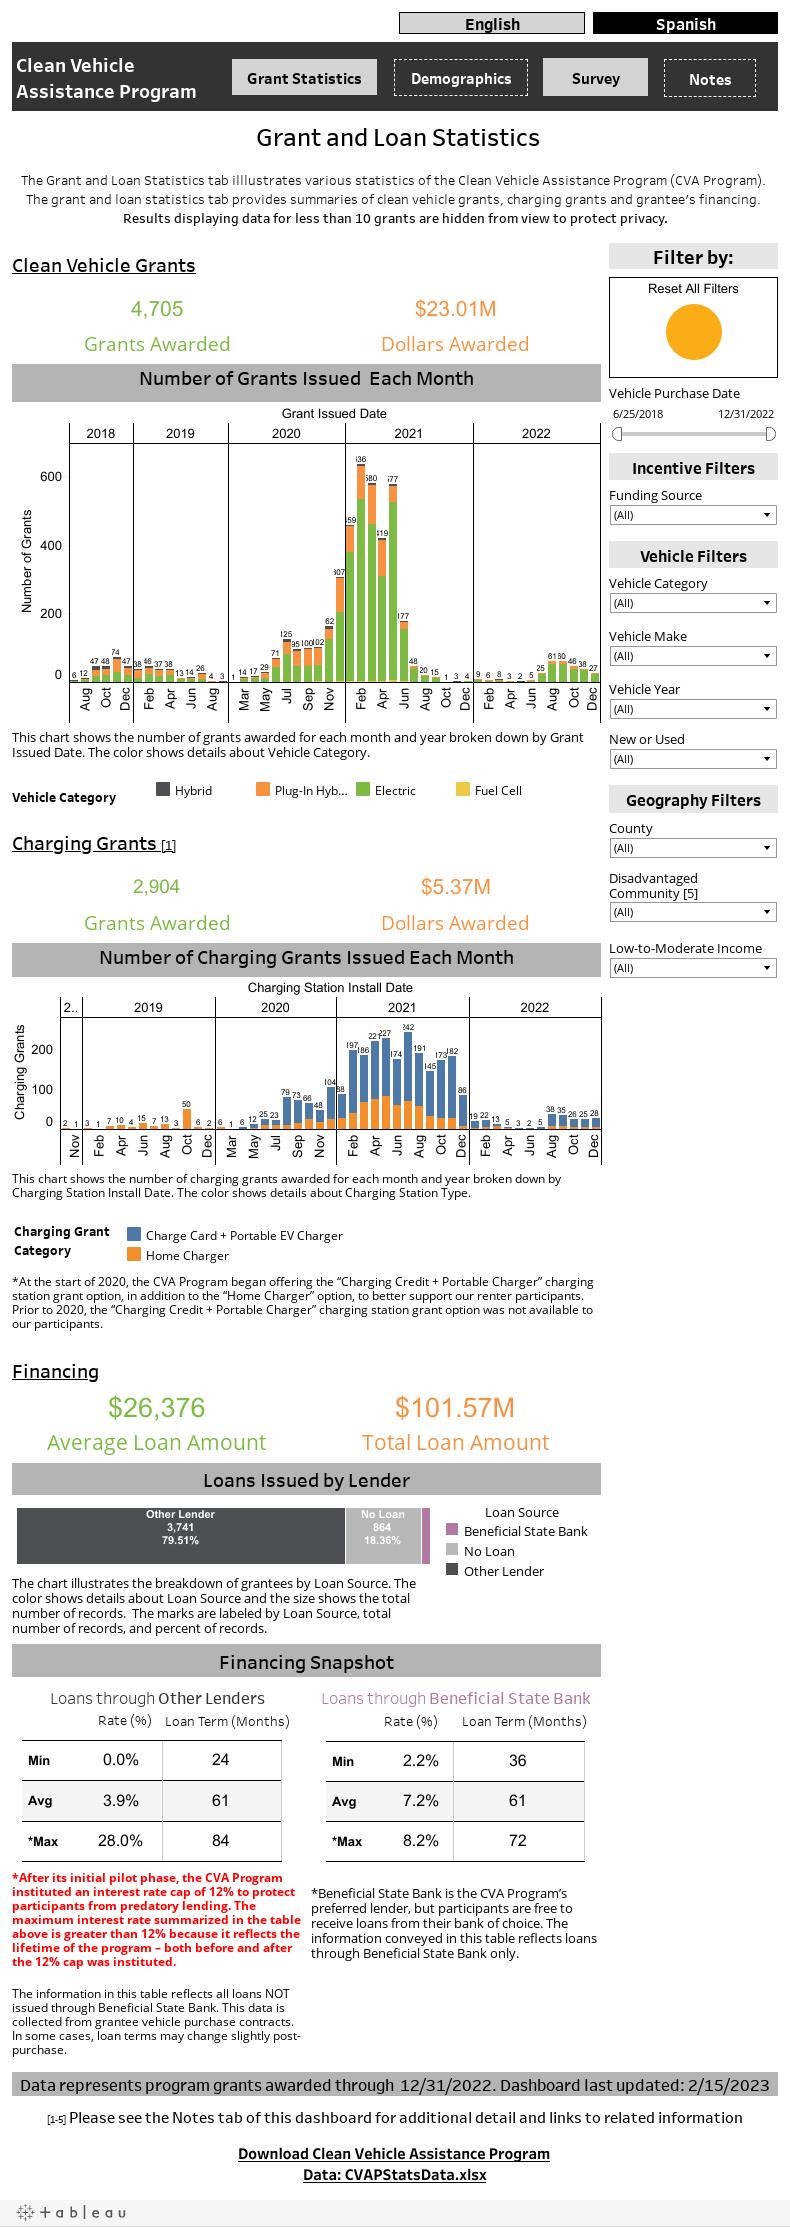 Grant and Loan Statistics